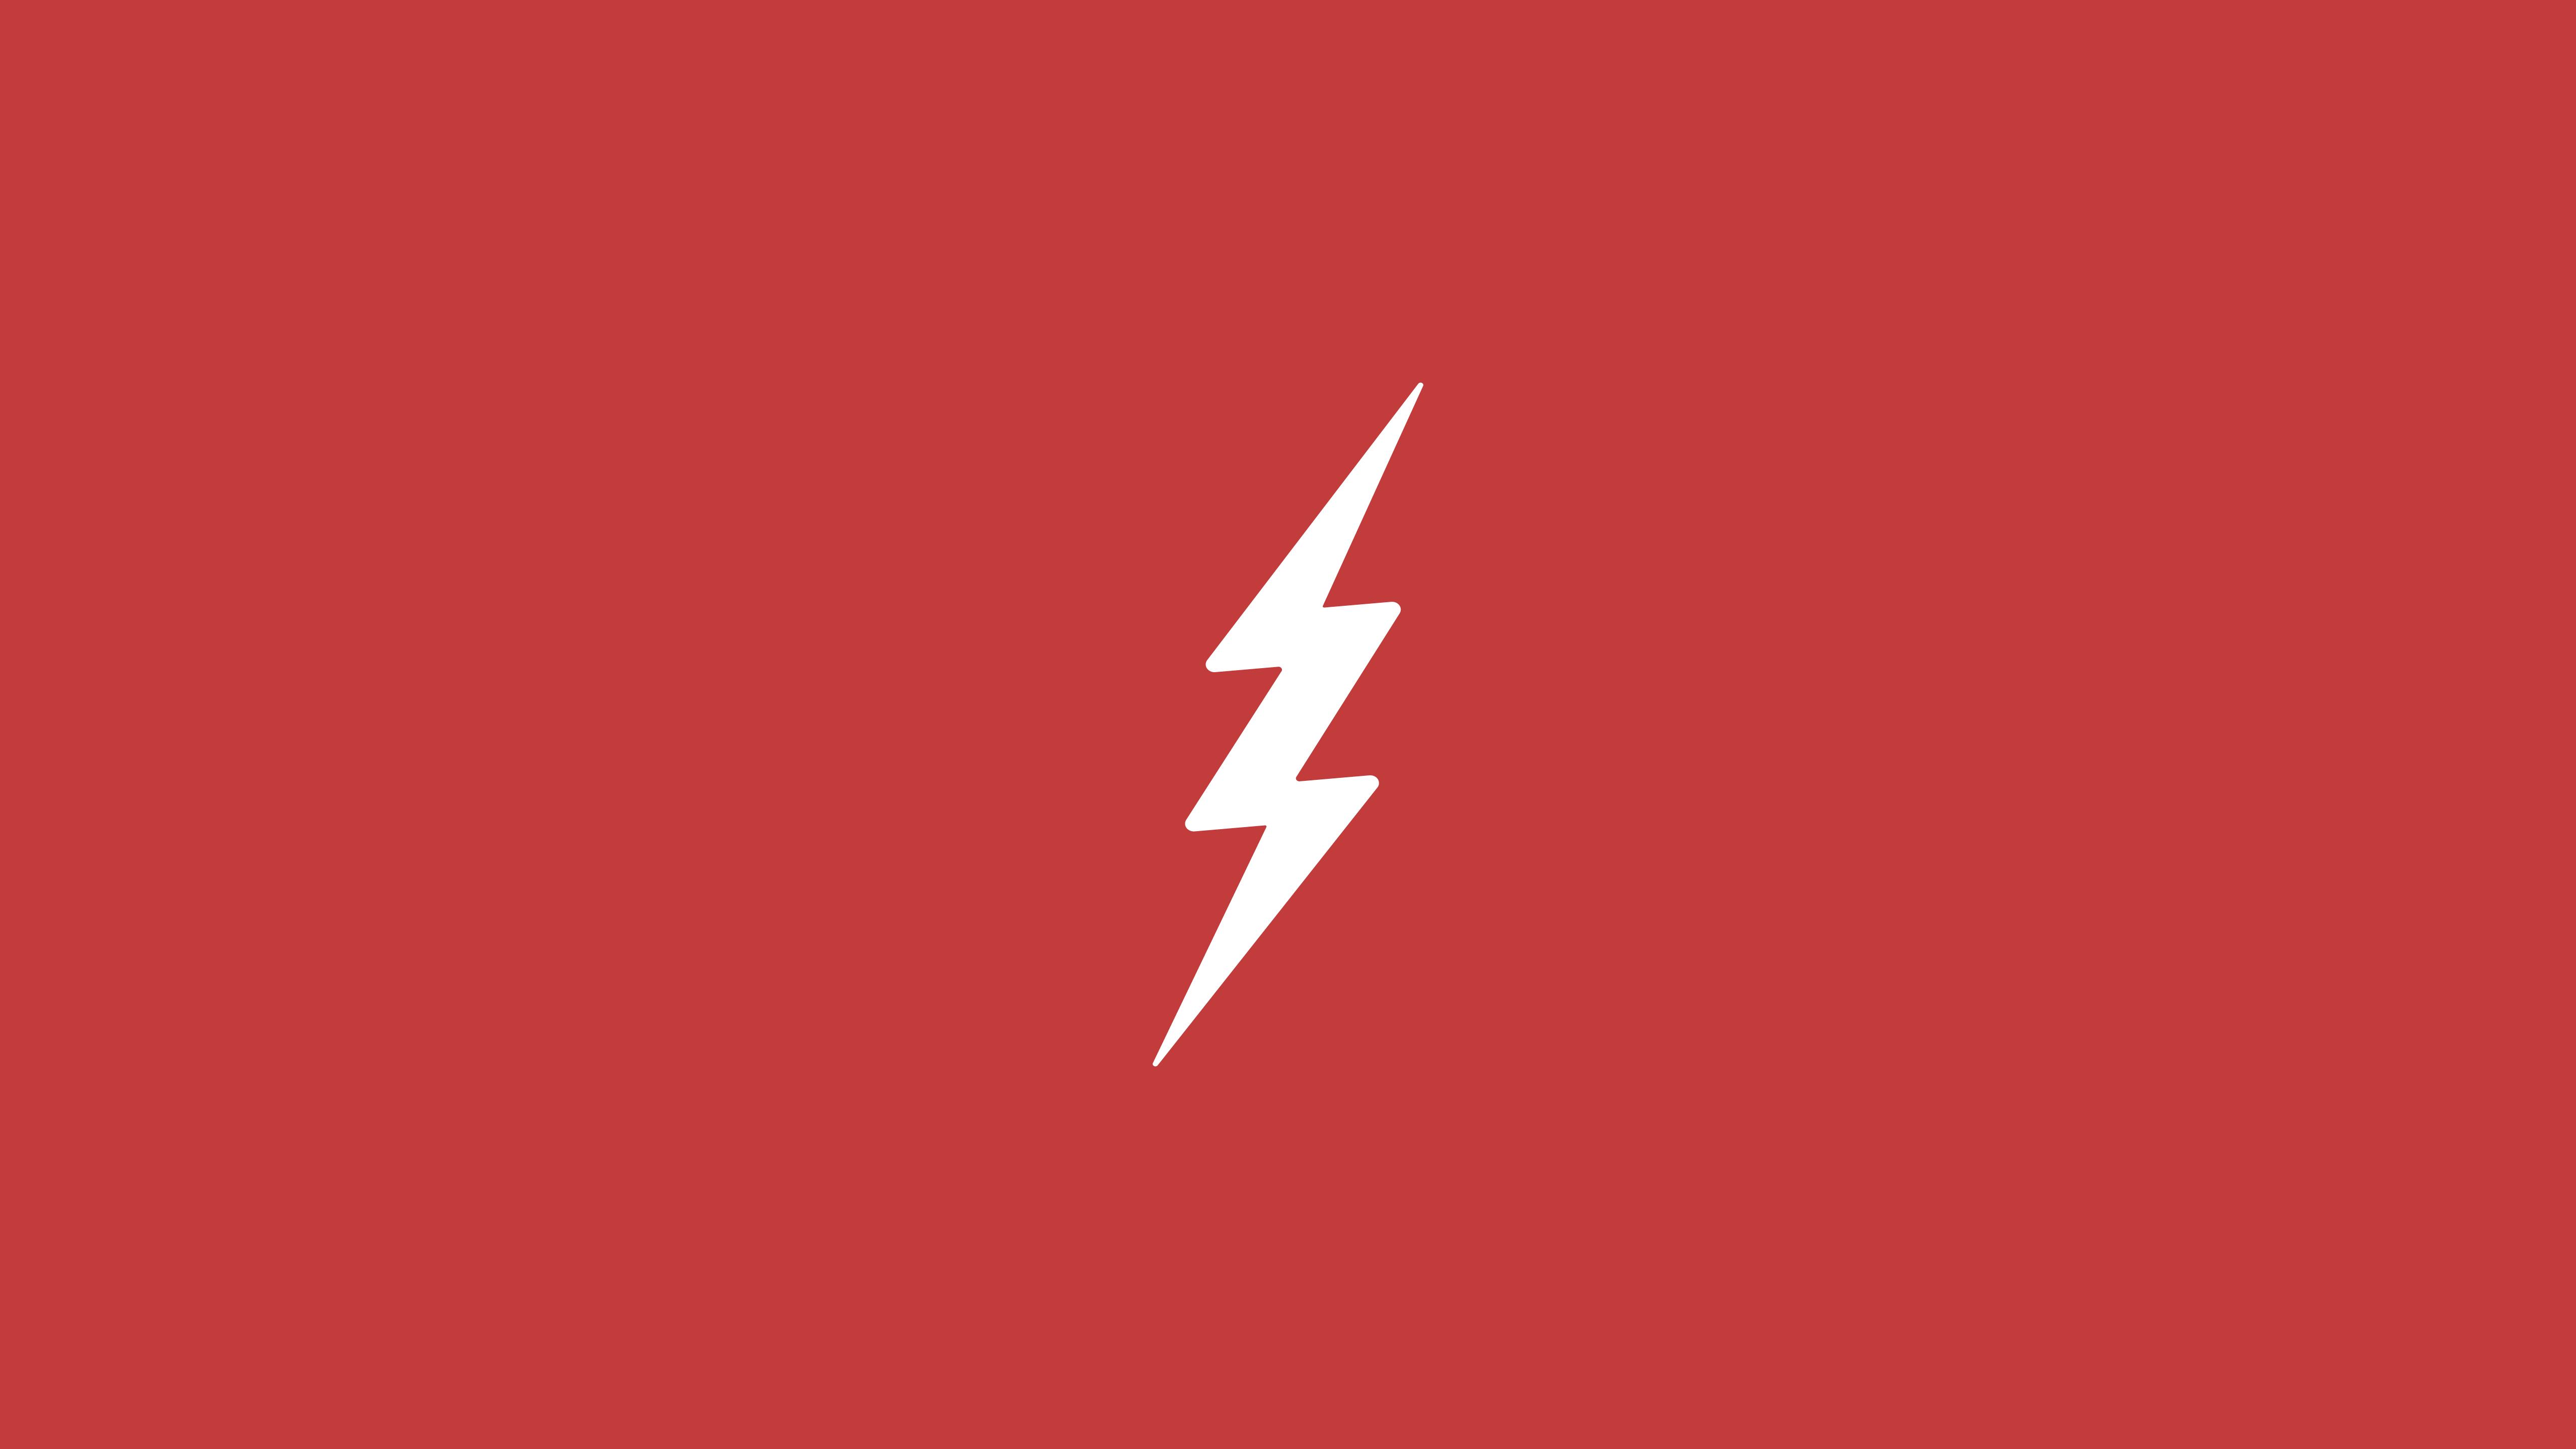 flash logo minimalism hd artist 4k wallpapers images